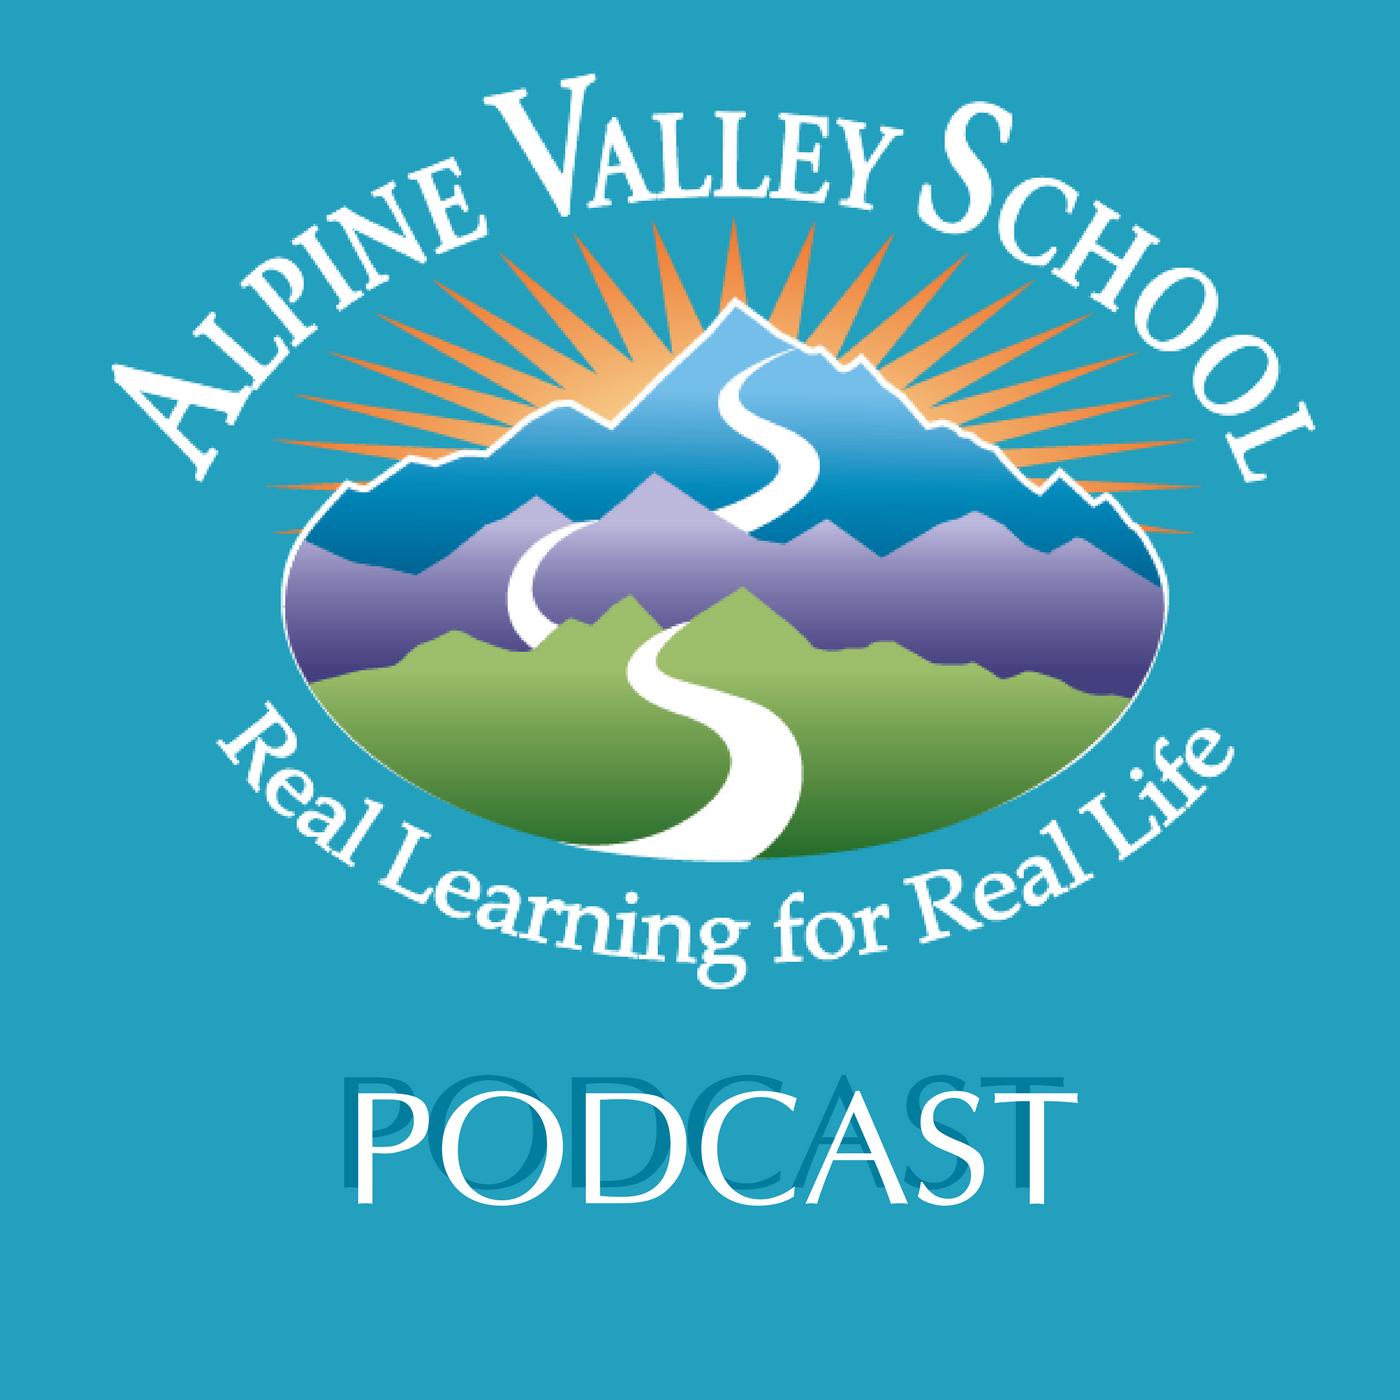 Alpine Valley School Podcast show art